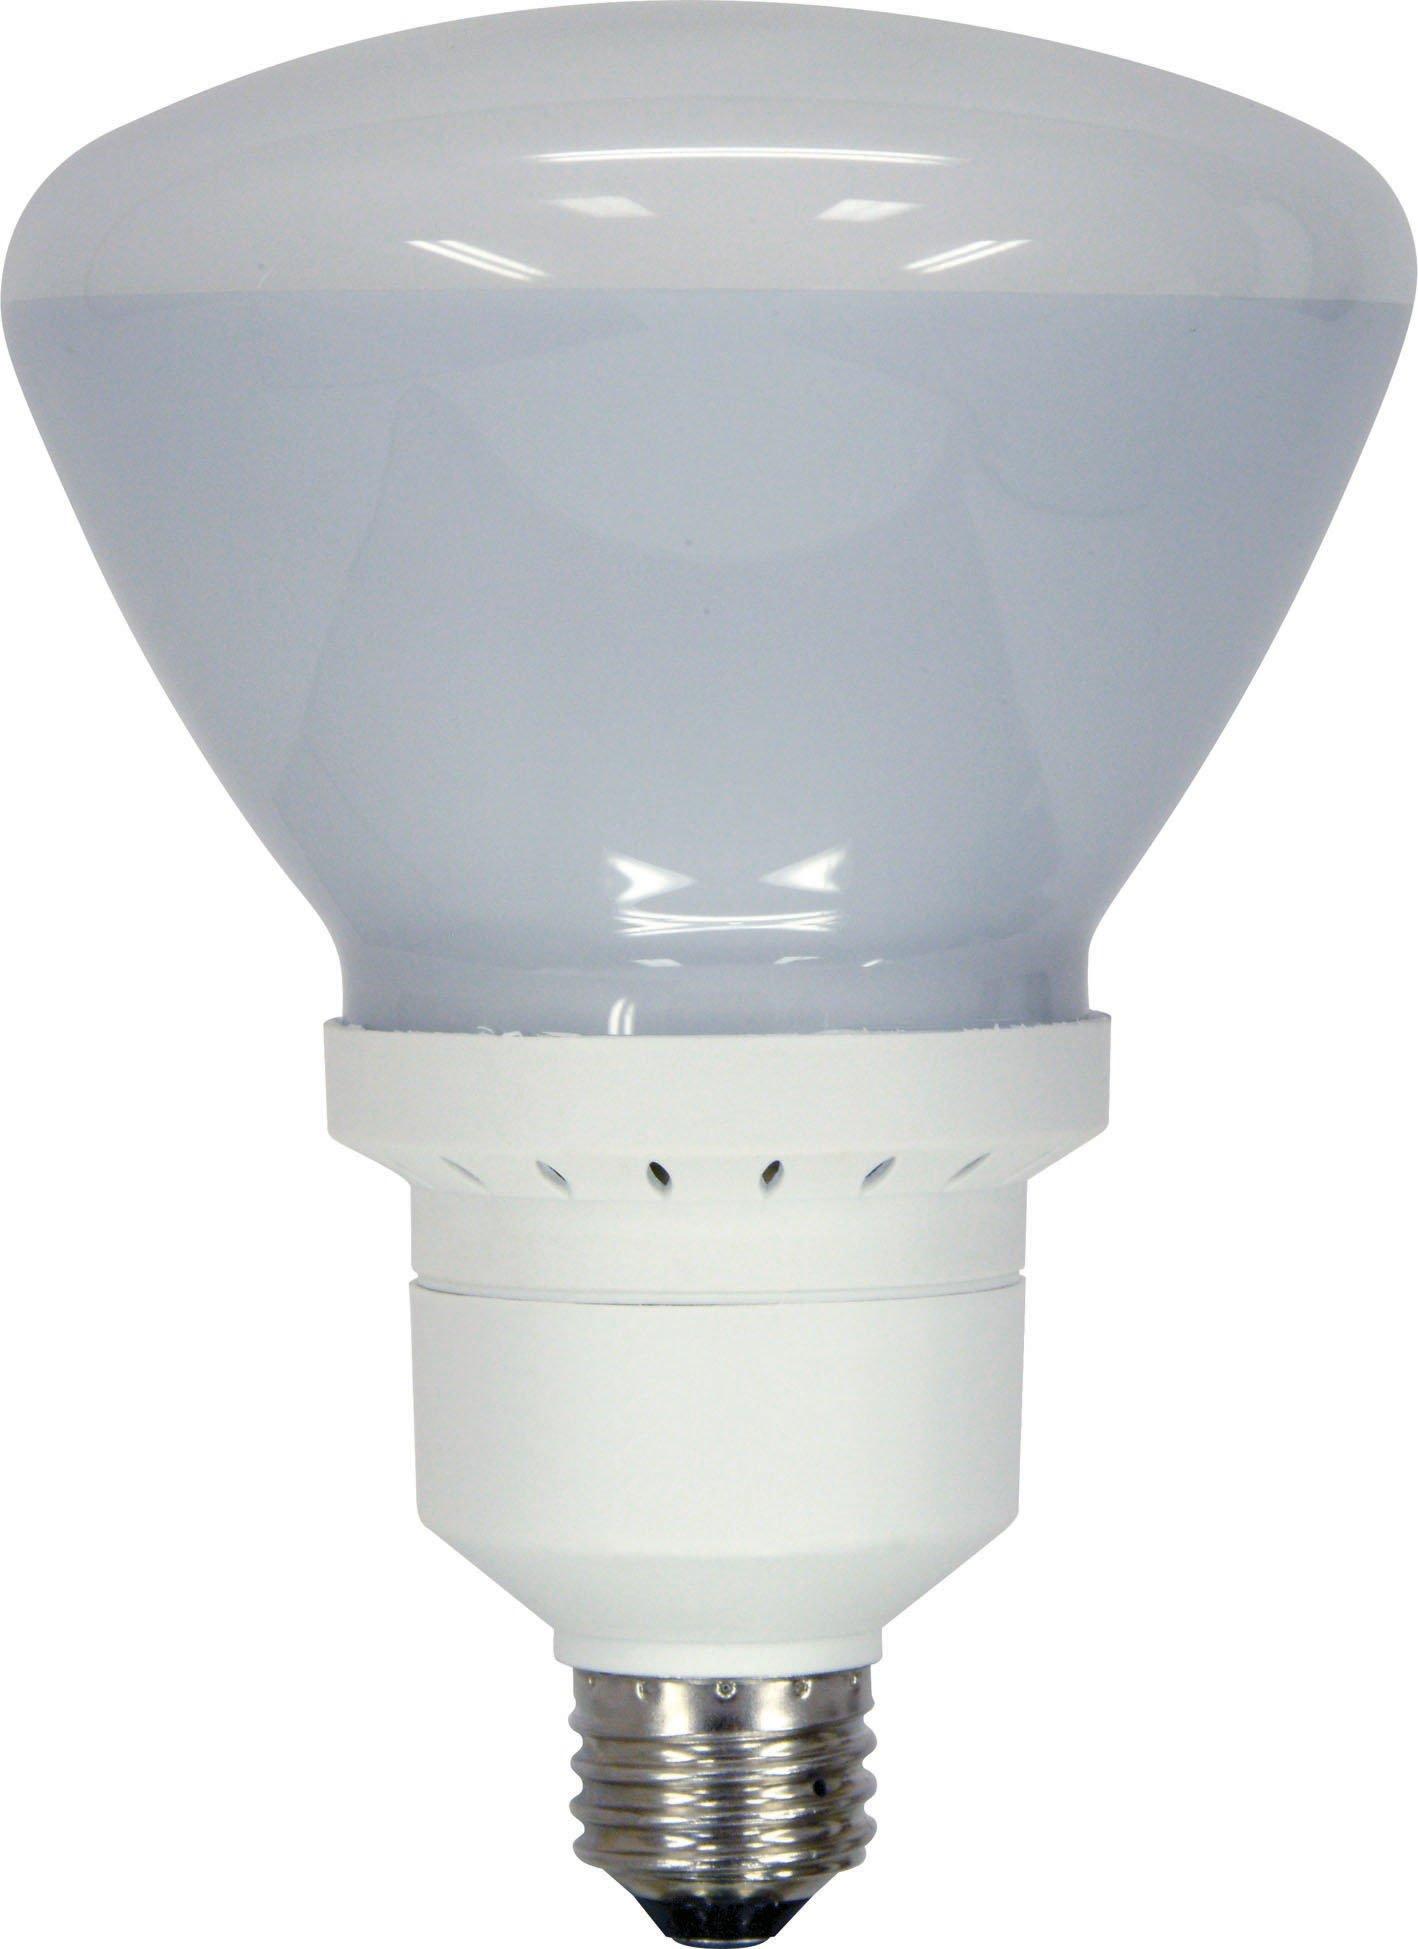 GE Lighting 80894 Energy Smart CFL 26-Watt (100-watt replacement) 1300-Lumen R40 Floodlight Bulb with Medium Base, 1-Pack